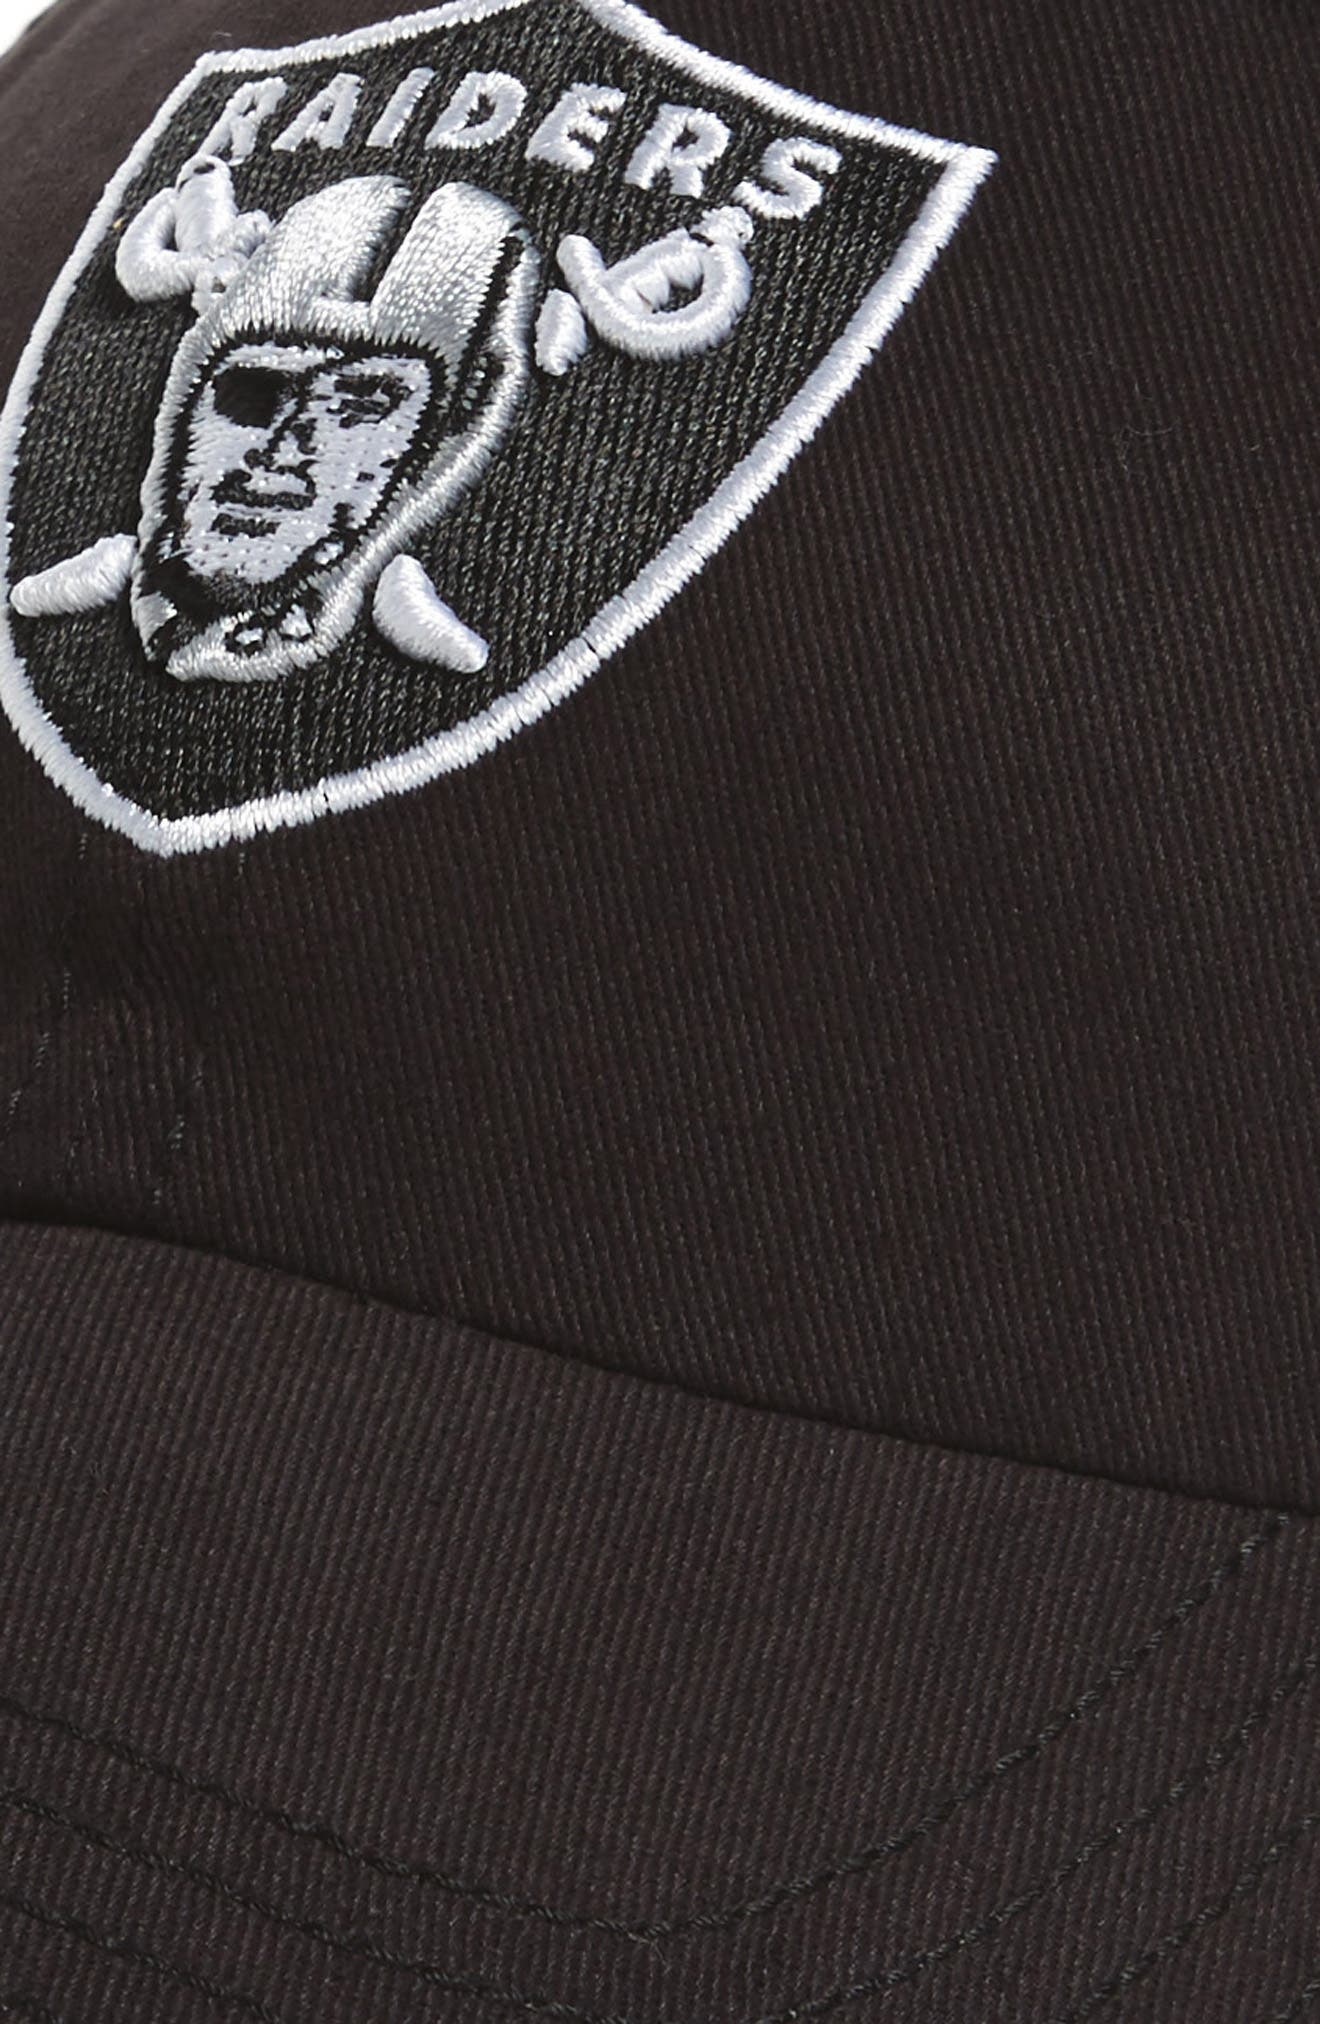 Miata Clean Up Oakland Raiders Ball Cap,                             Alternate thumbnail 3, color,                             001